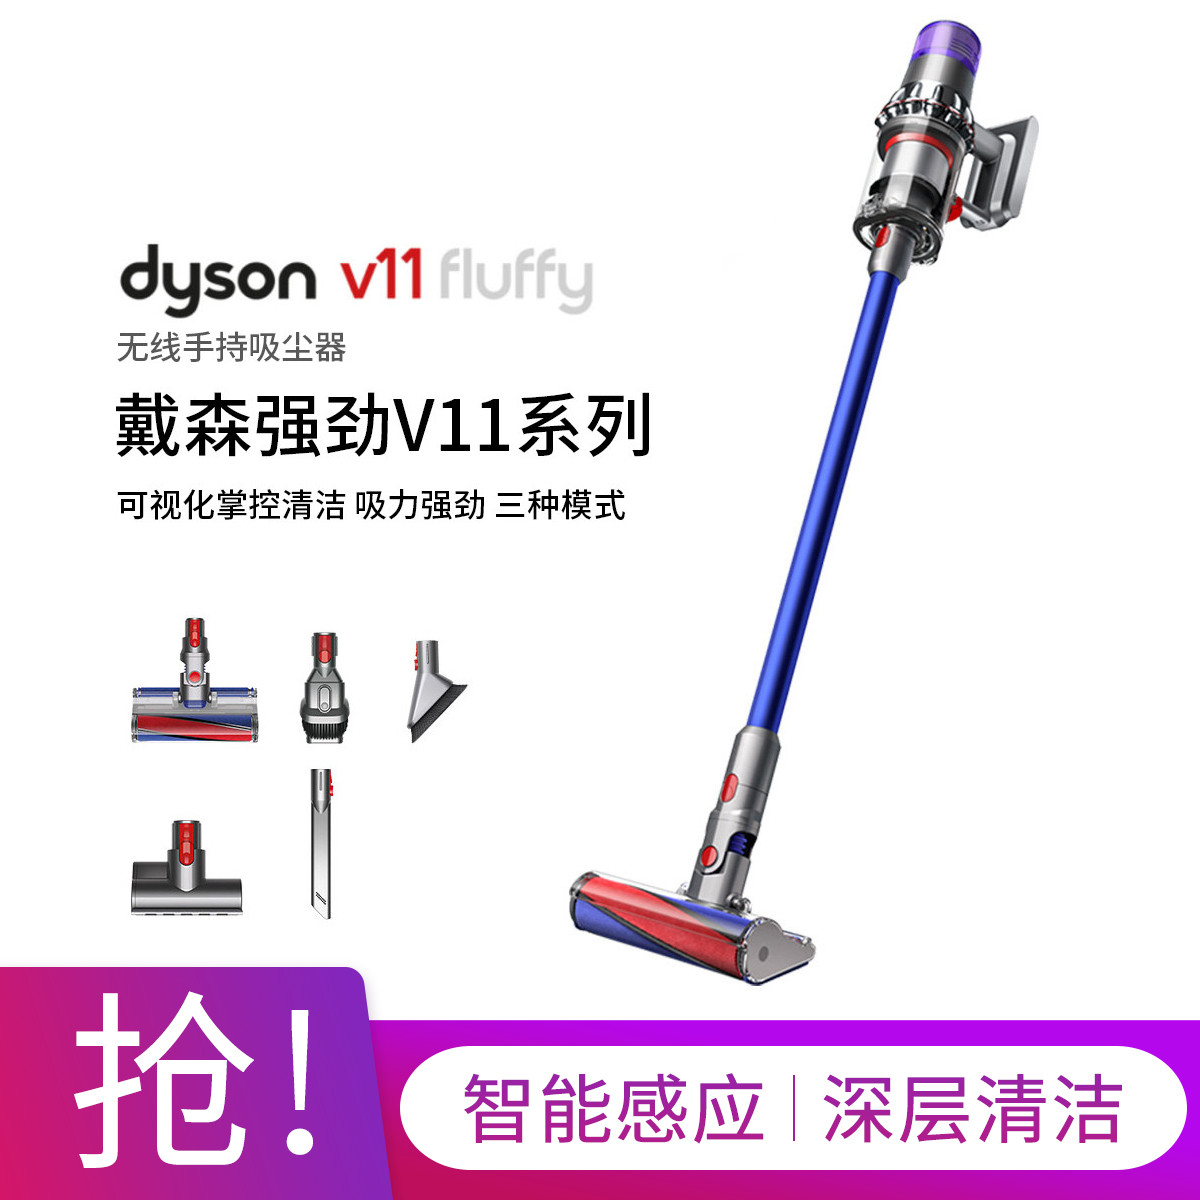 【V11深层清洁木地板】V11 Fluffy无线手持吸尘器除螨